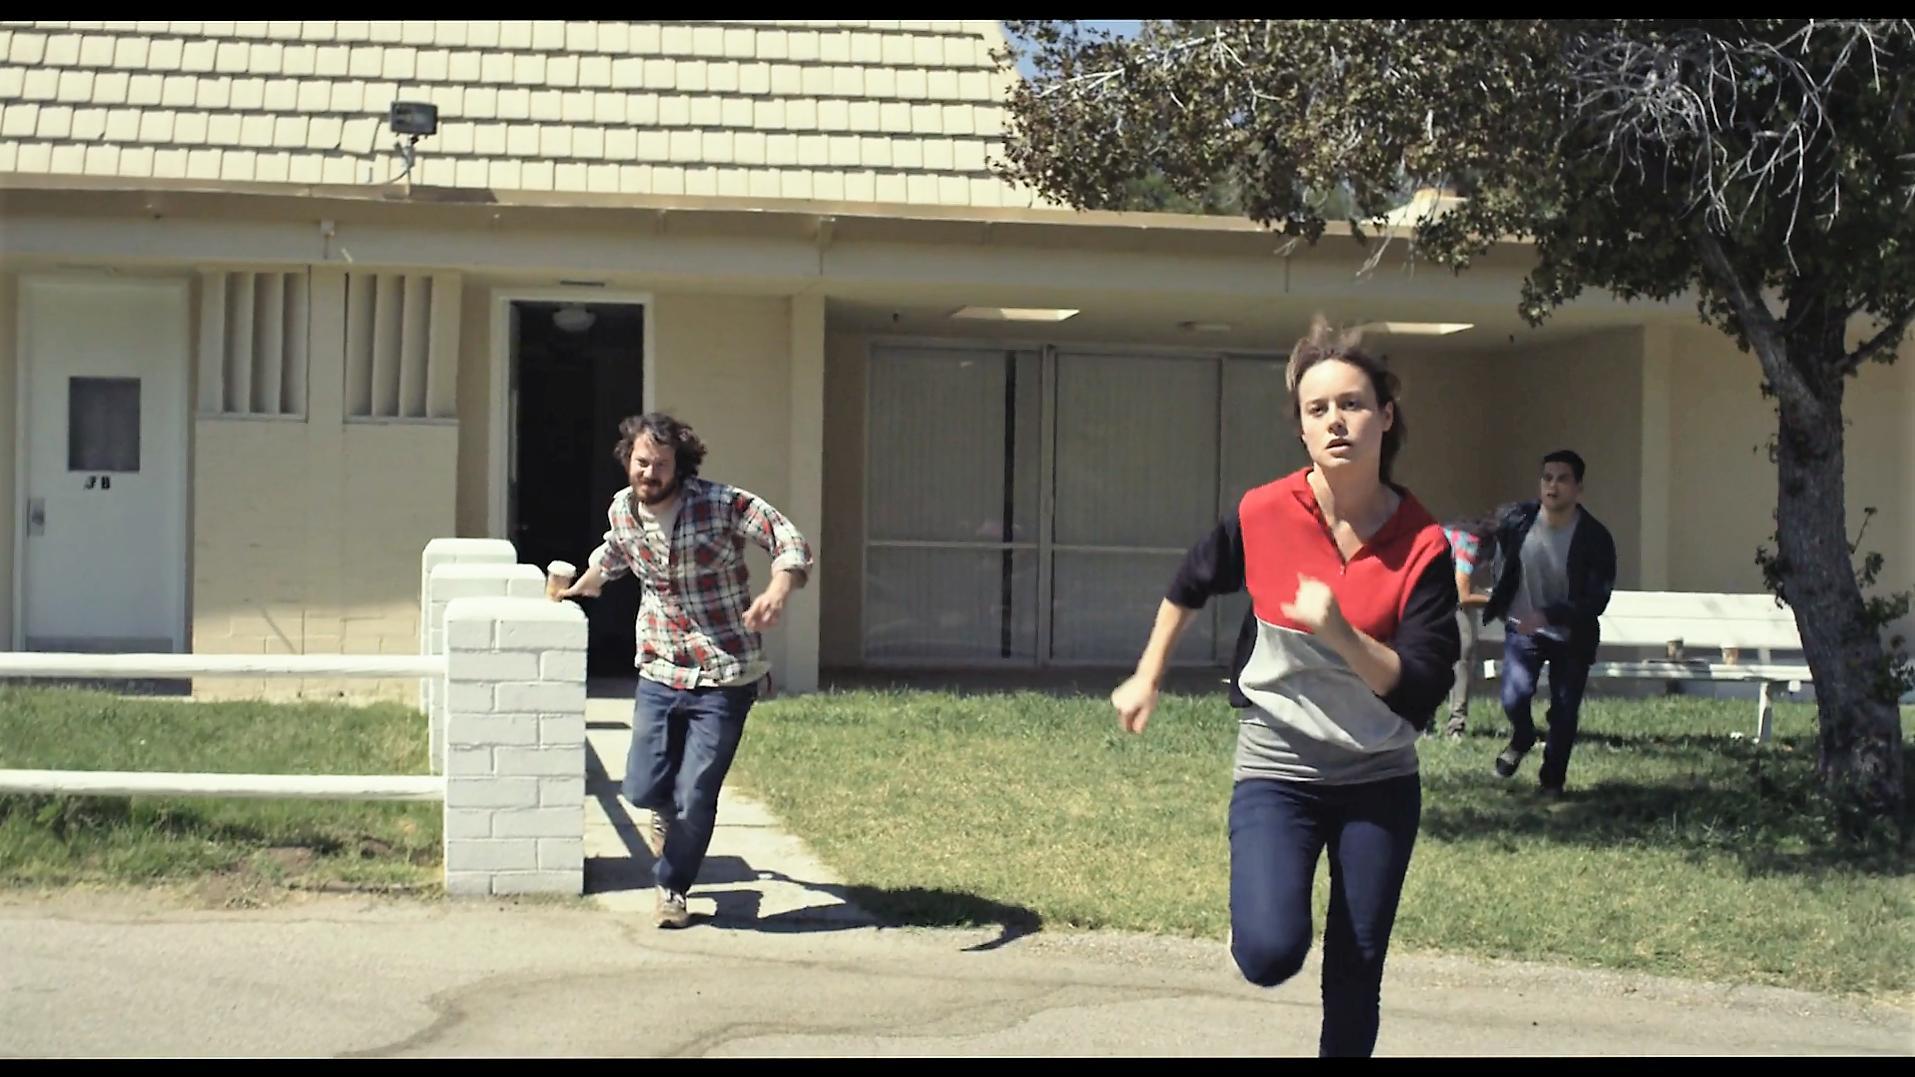 John Gallagher Jr., Brie Larson, and Rami Malek at an event for Short Term 12 (2013)